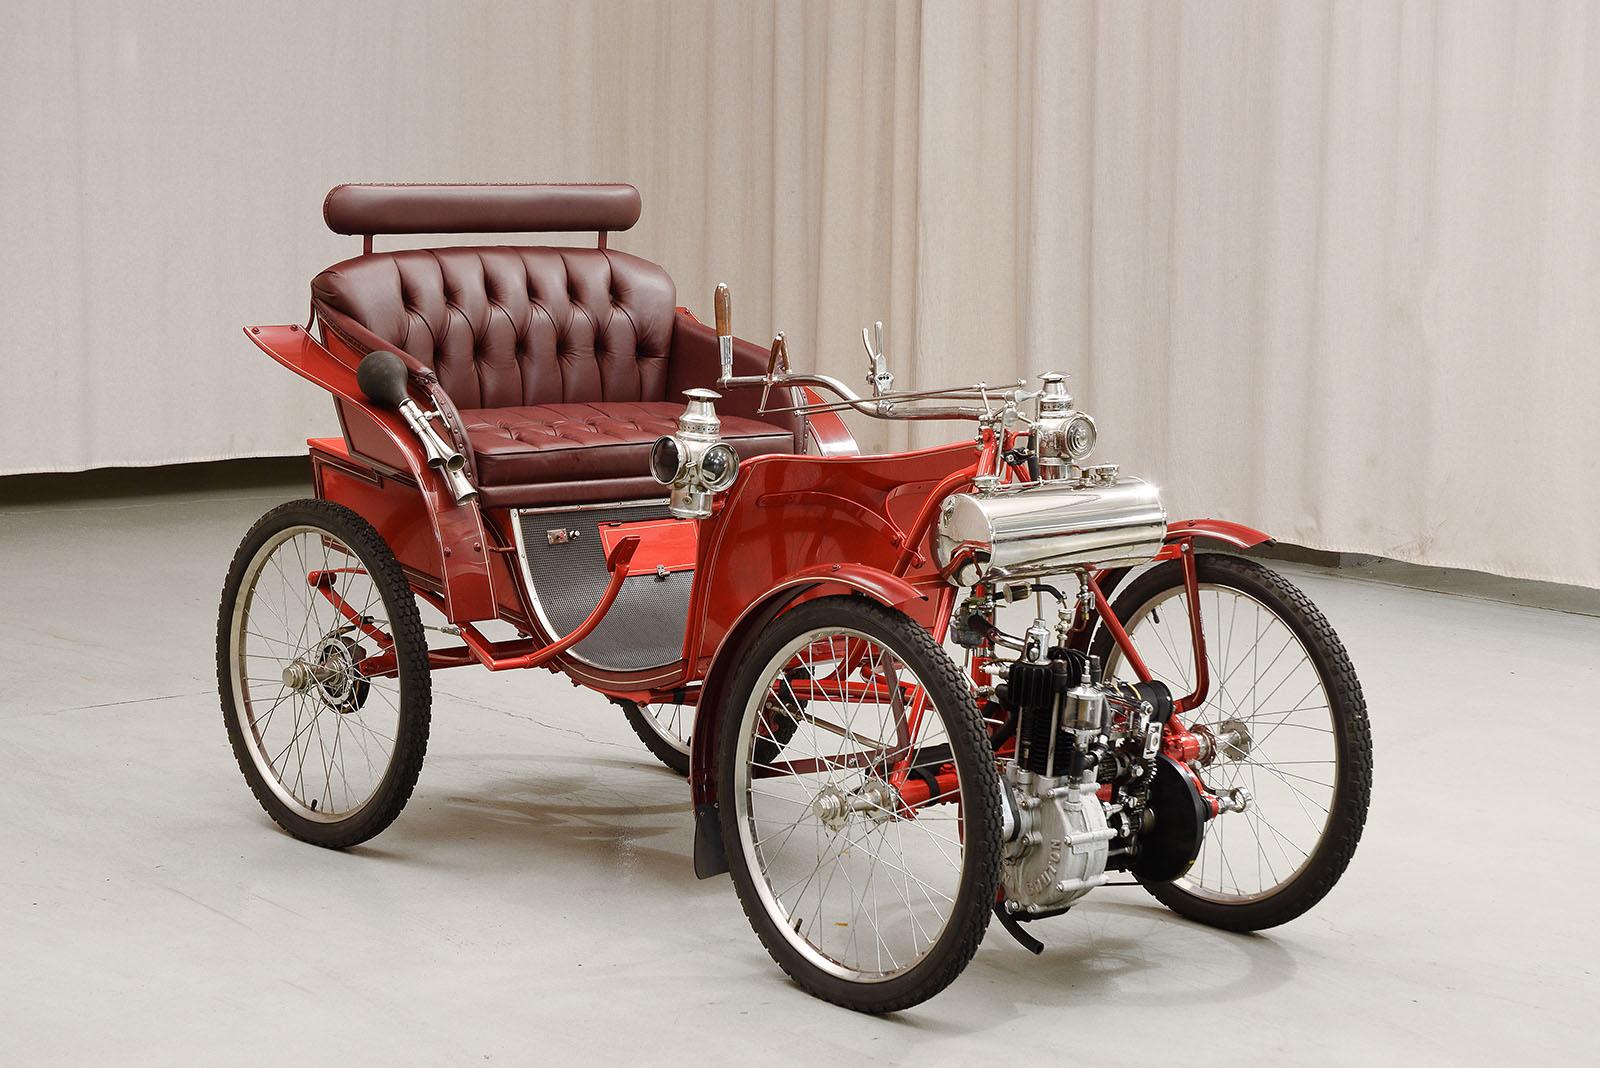 1899 Parisienne Victoria Combination Sold by Hyman LTD ...